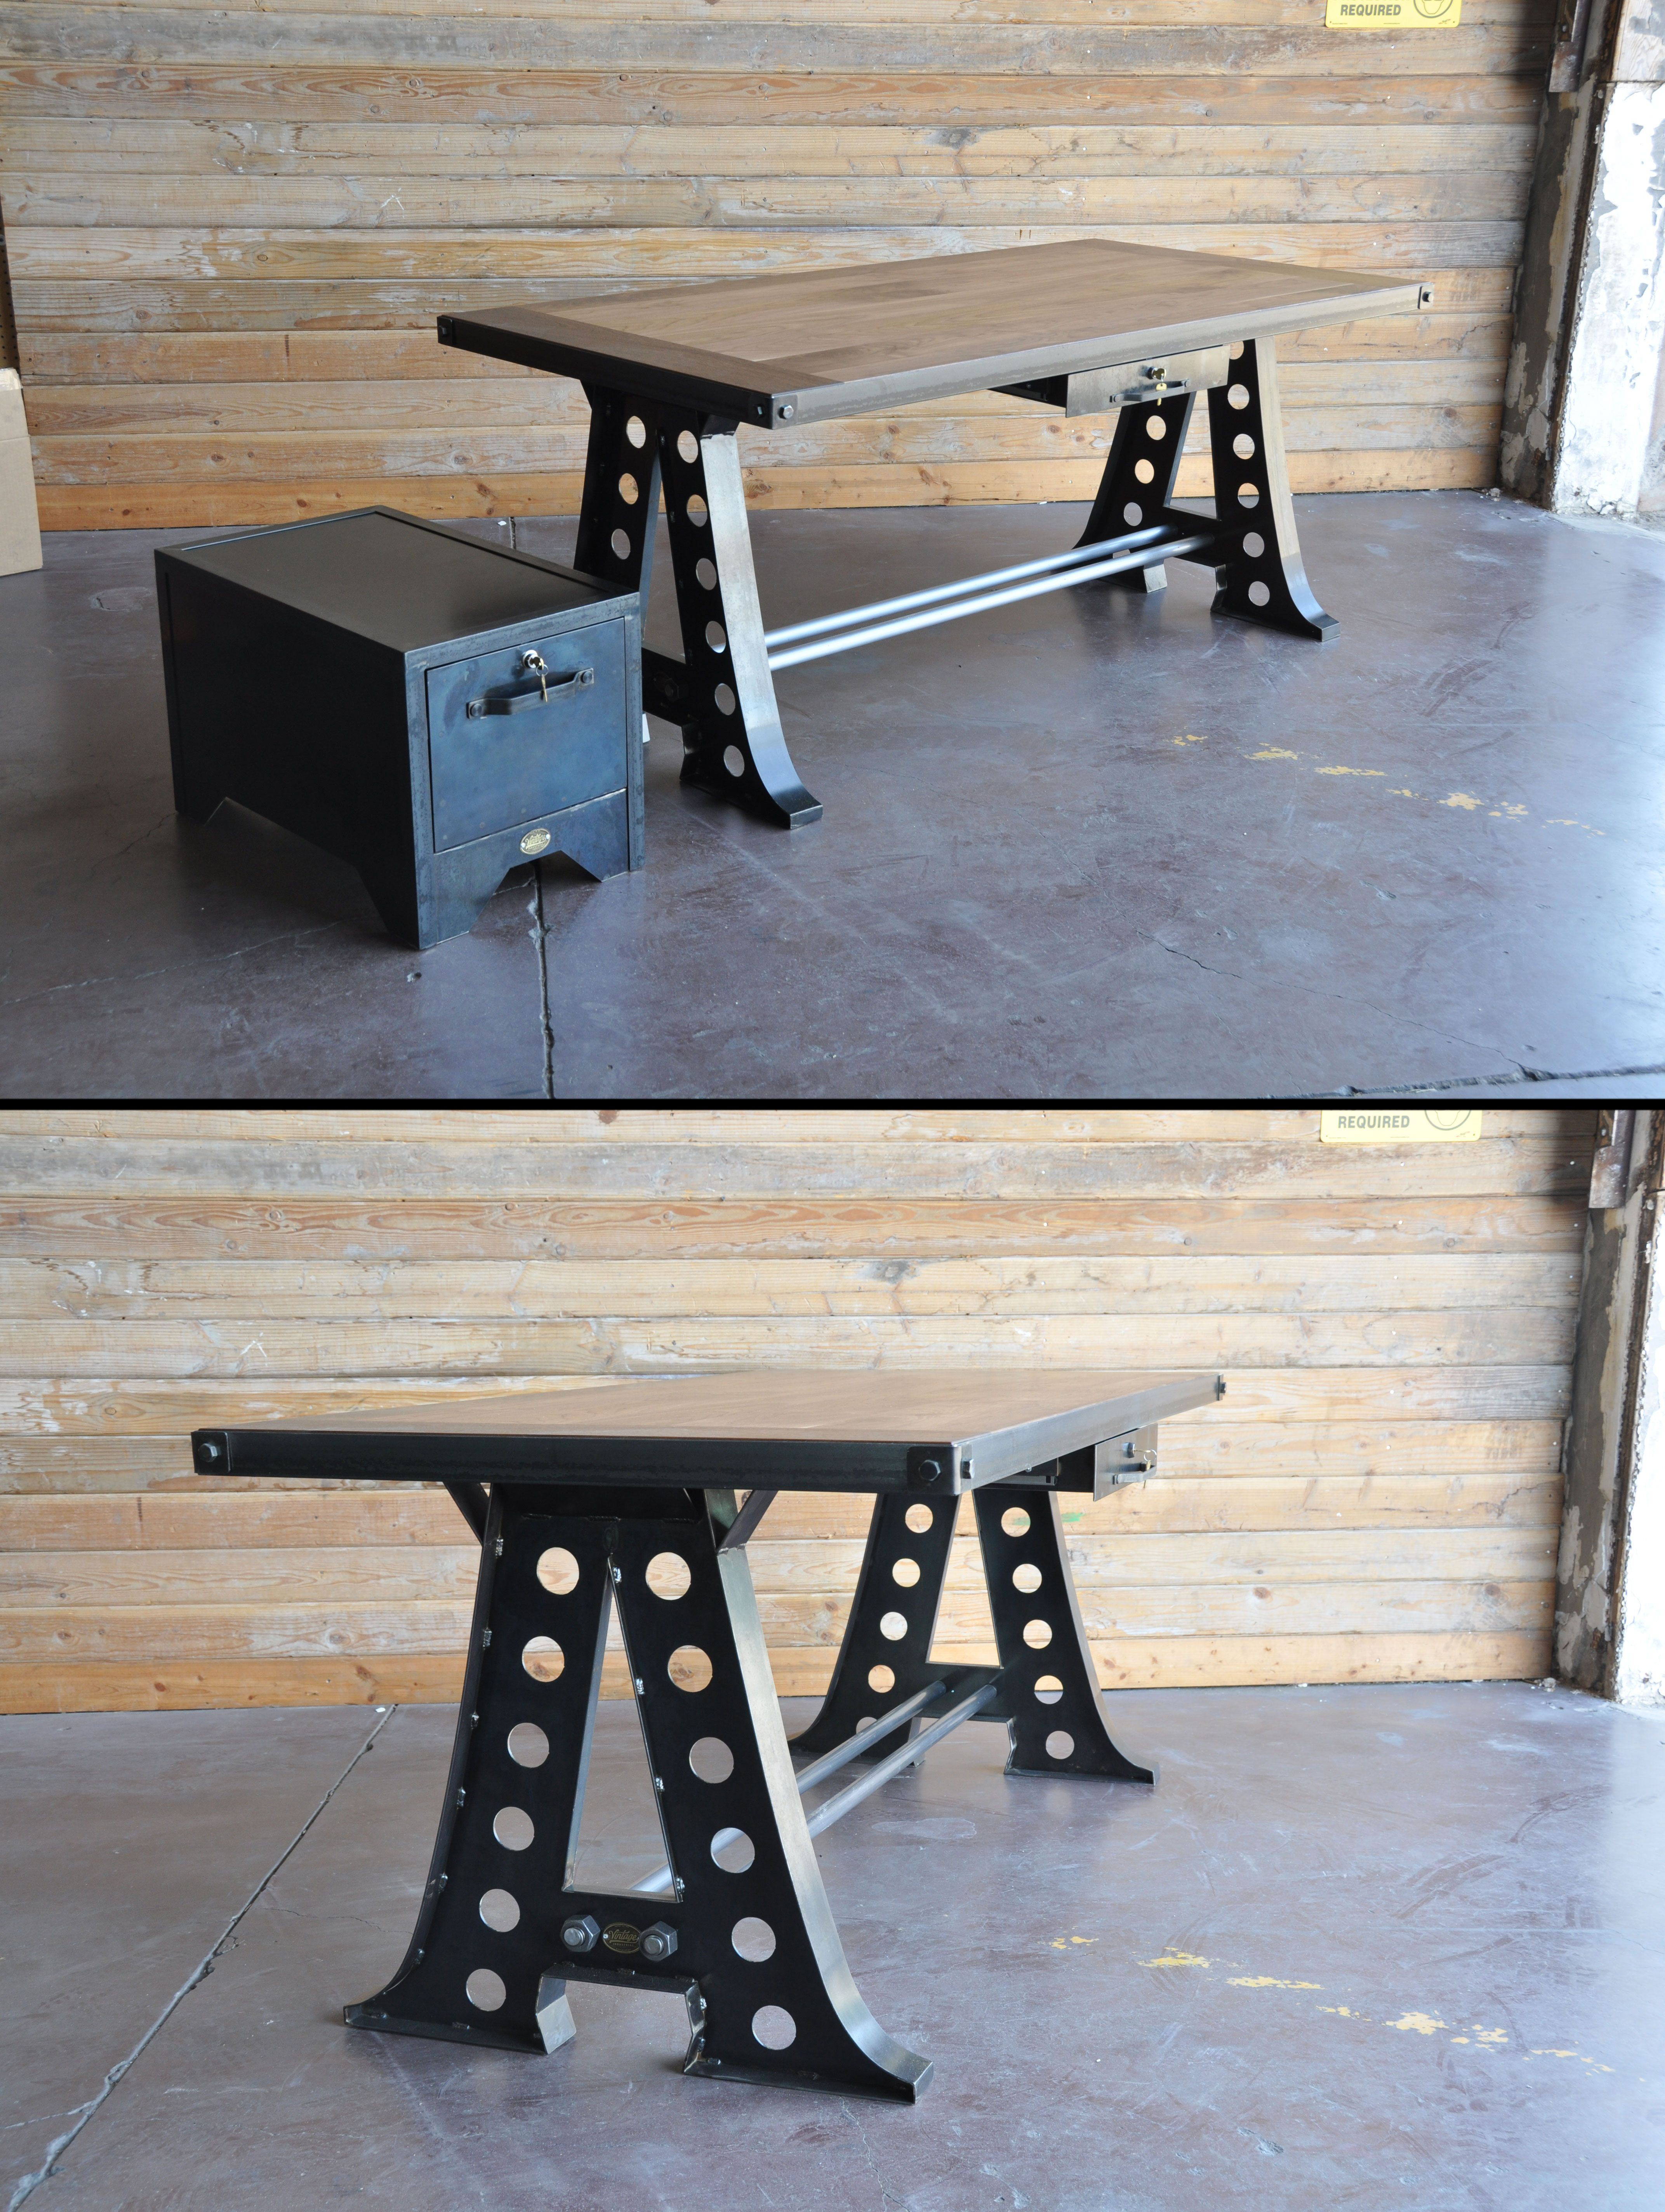 A Frame Desk By Vintage Industrial Furniture In Phoenix, Az